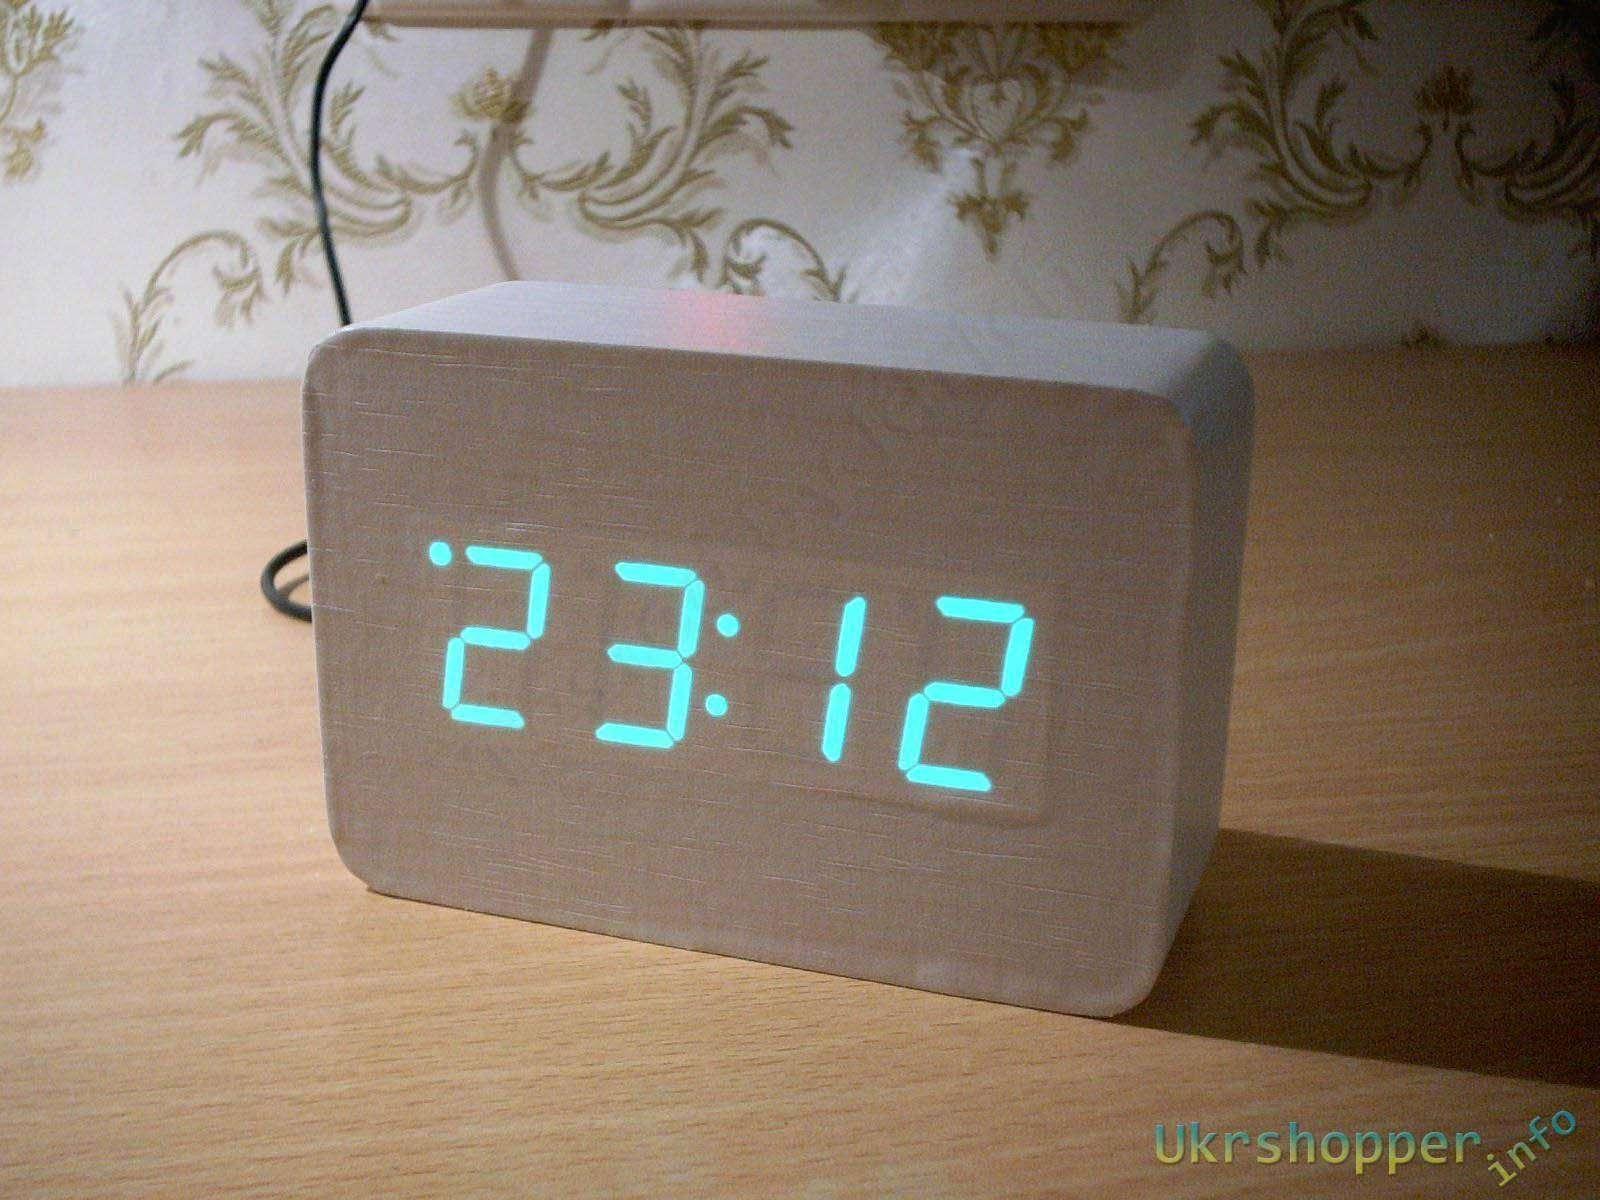 ChinaBuye: Часы, которые не тикают.